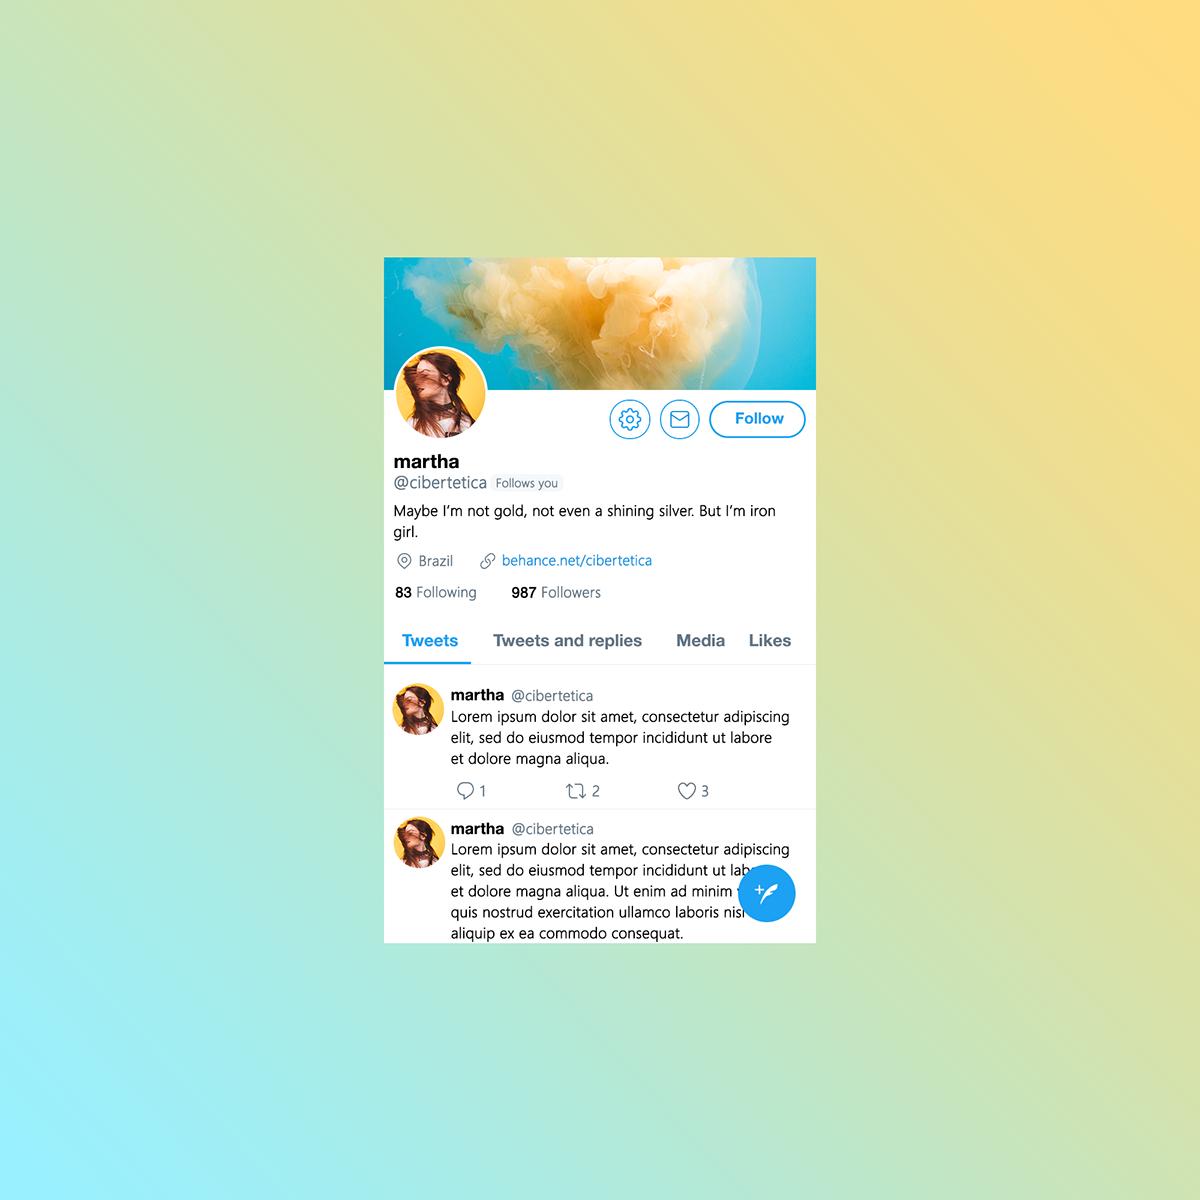 free twitter profile mockup template 2018 on pantone canvas gallery